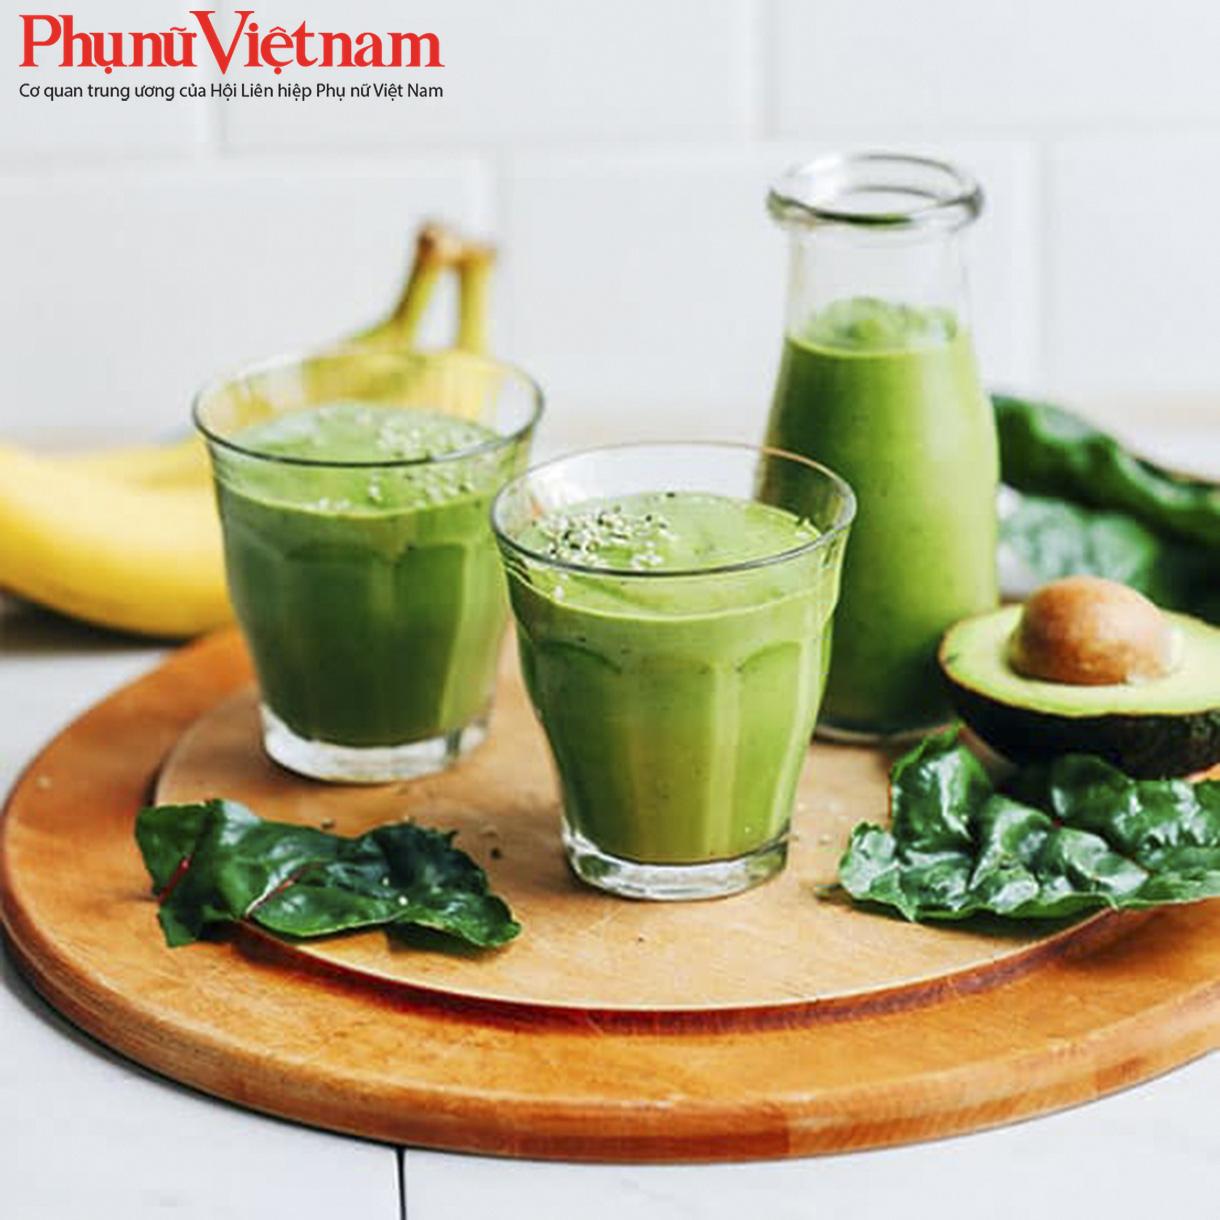 Món sinh tố tăng cường vitamin E